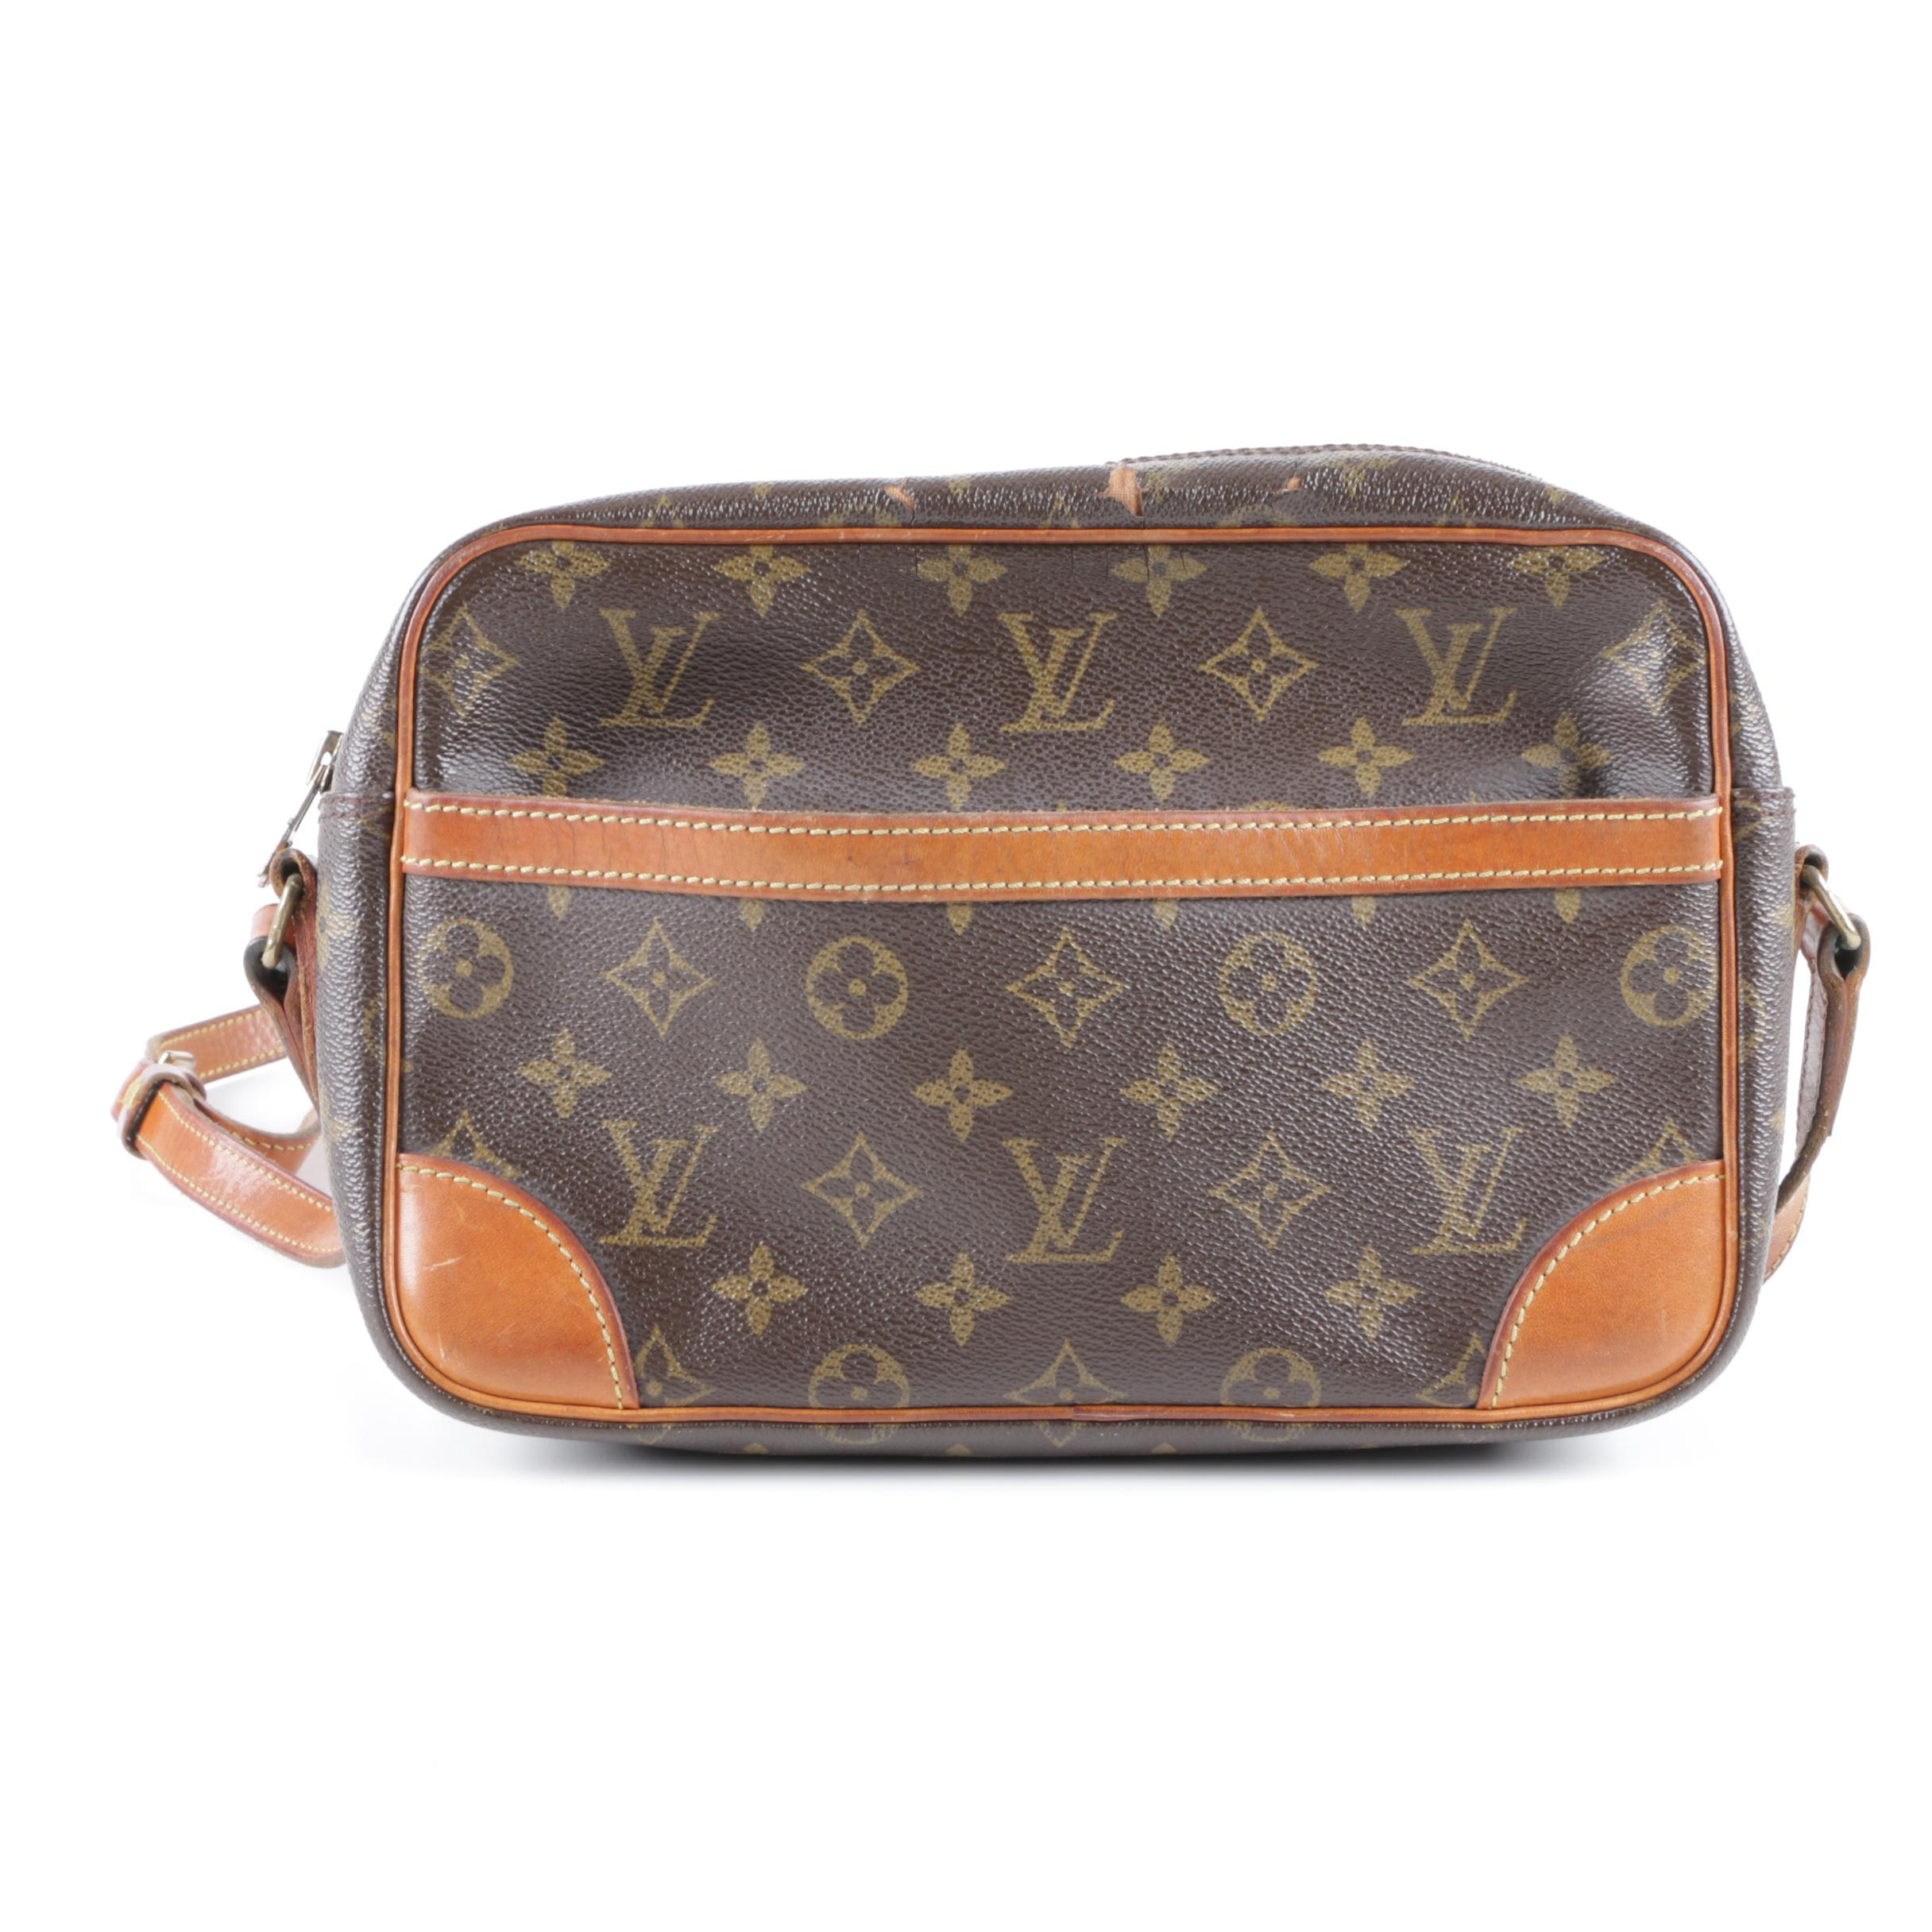 Vintage Louis Vuitton Monogram Canvas Crossbody Bag Ebth